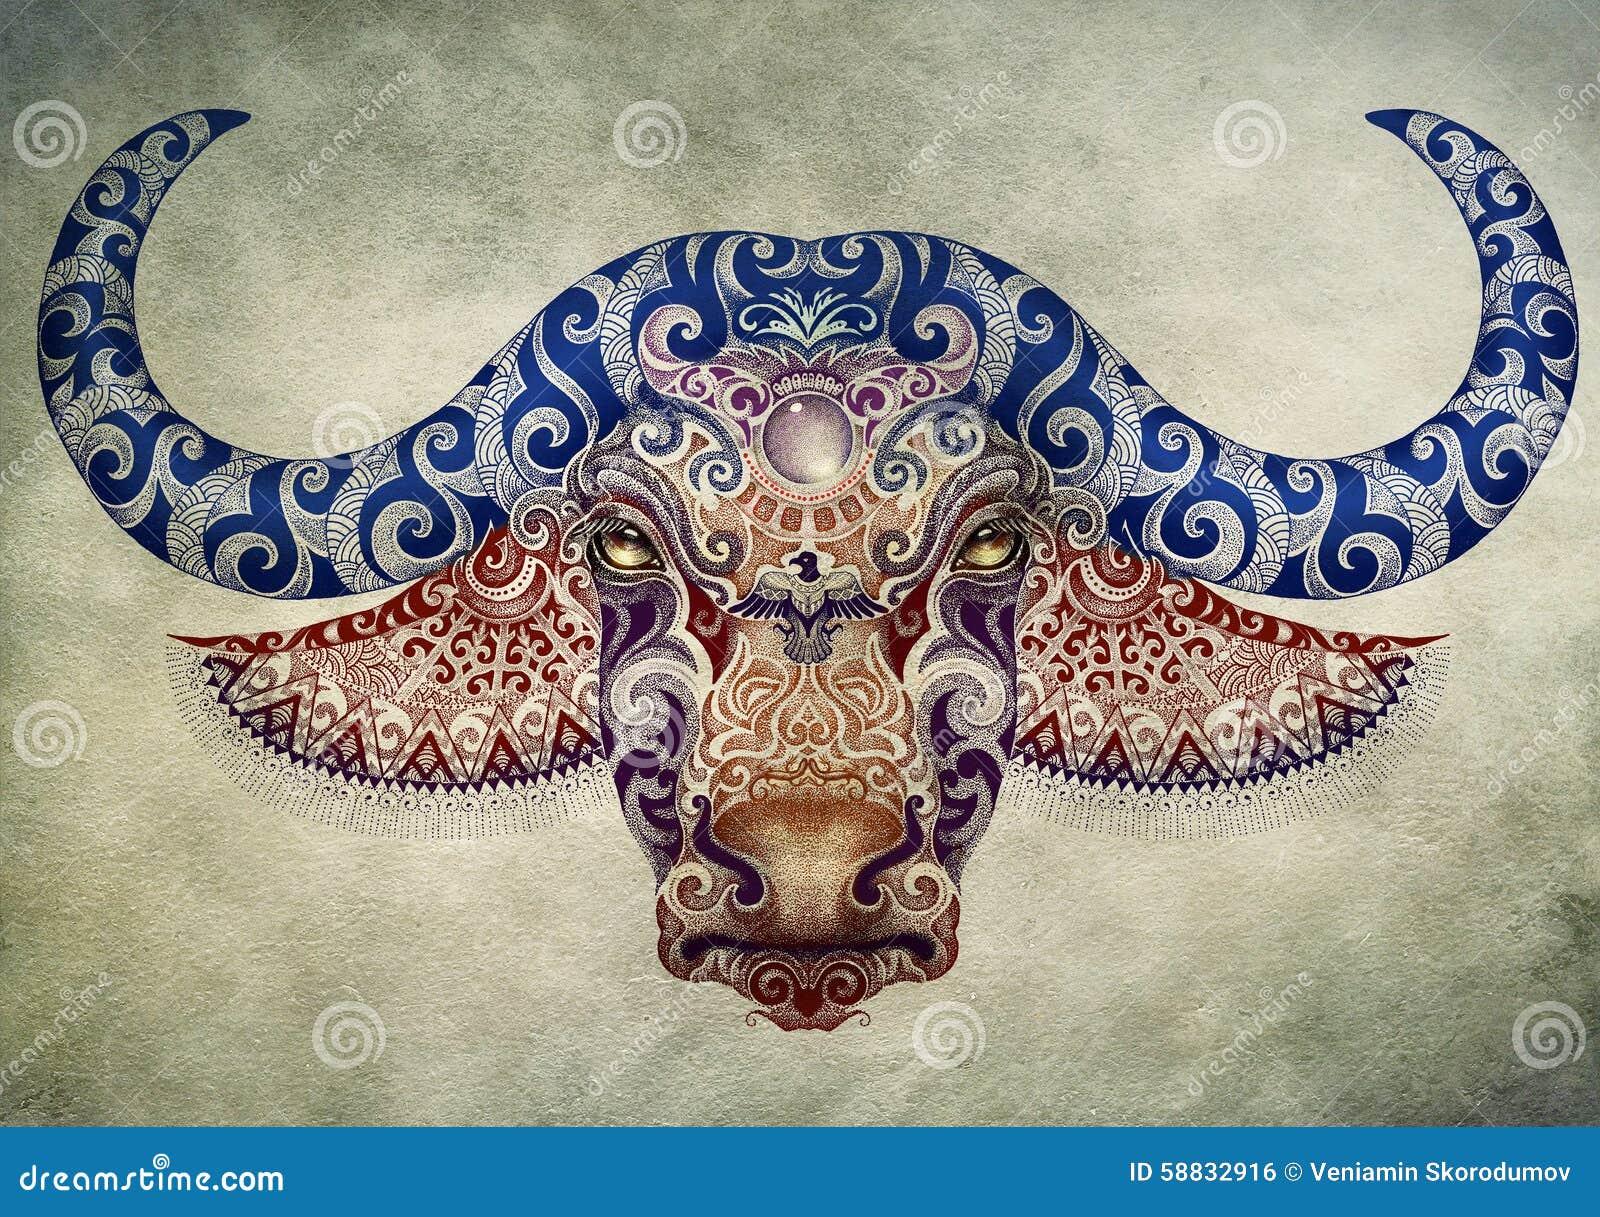 Top Tattoo, Bull, Buffalo Head With Horns Stock Illustration  FV91